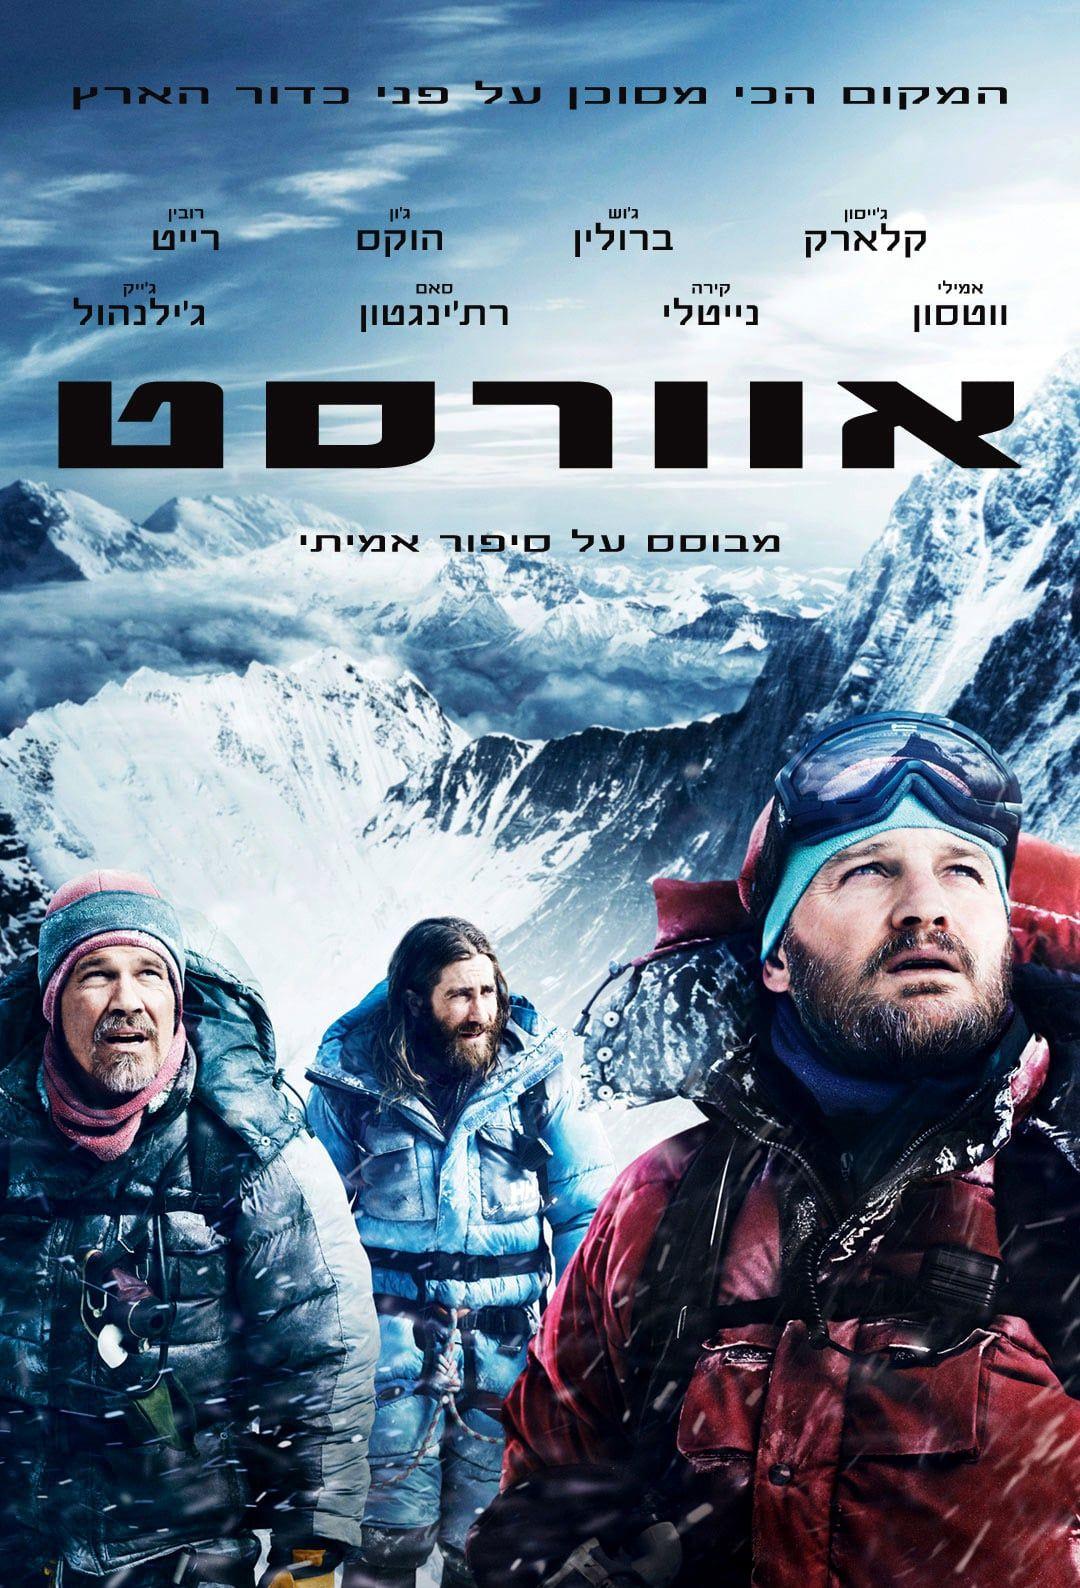 [HD1080p] Everest FULL MOVIE HD1080p Sub English